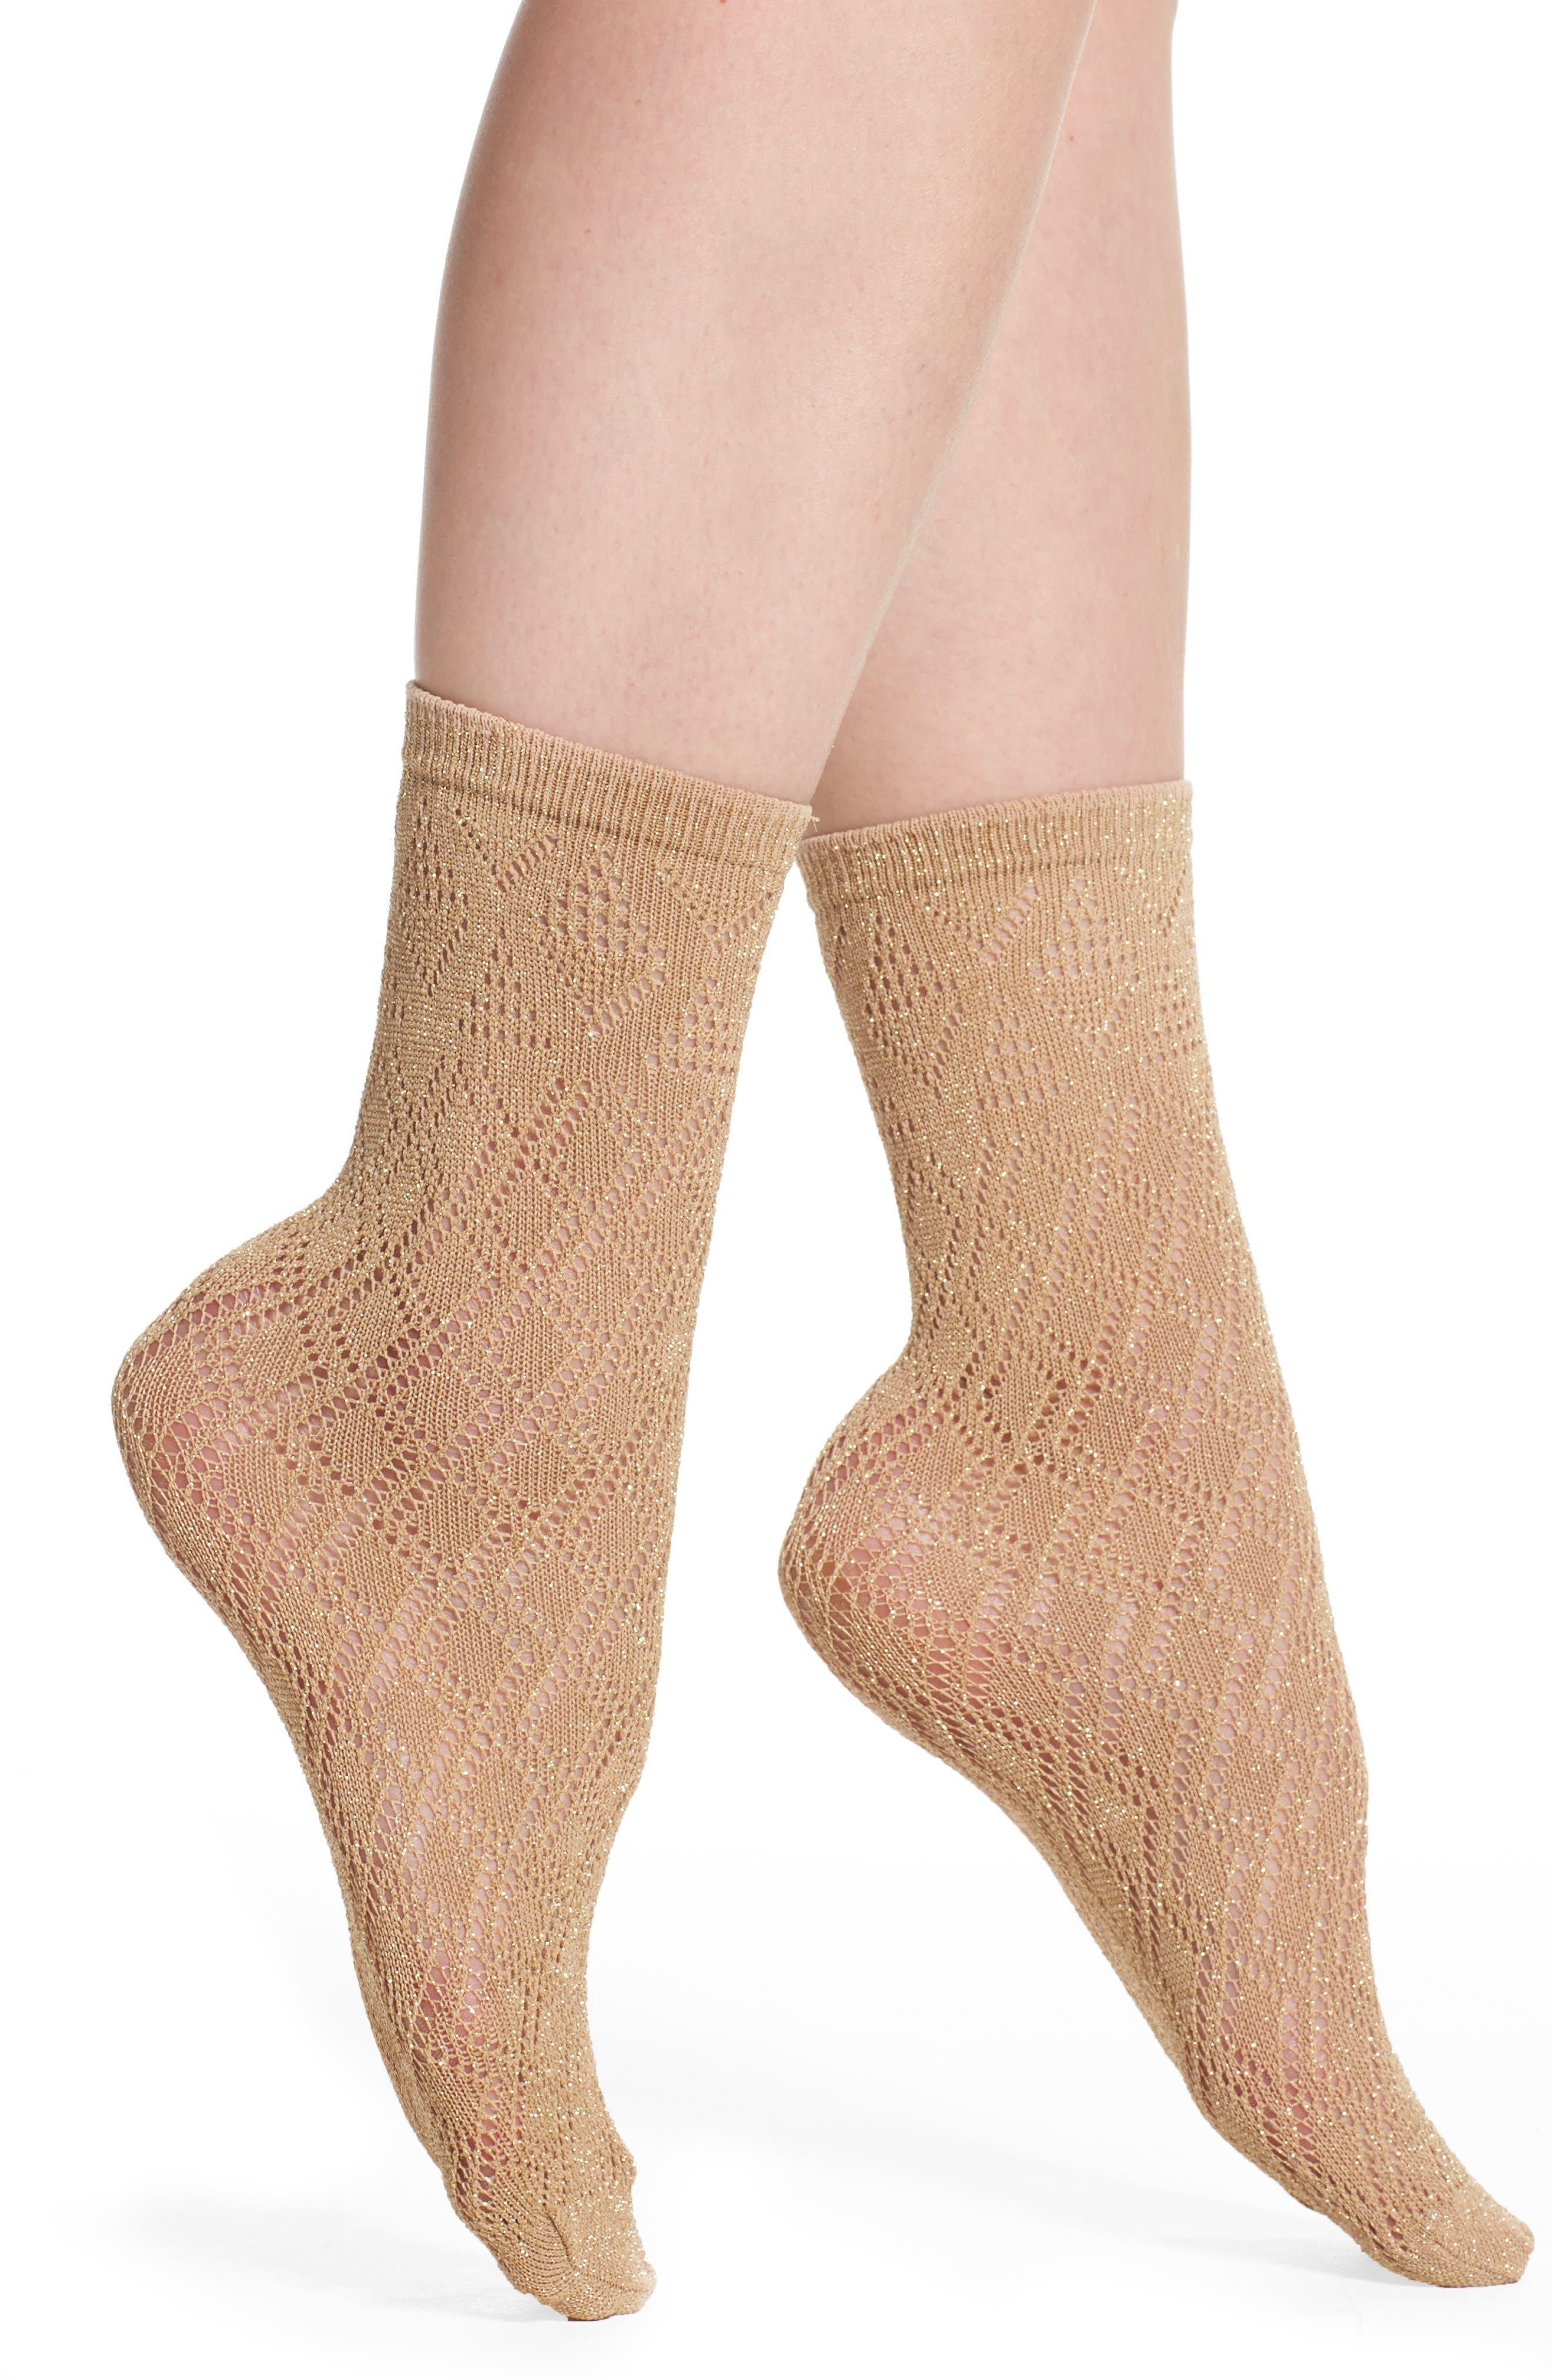 Kathy Trouser Socks,                             Main thumbnail 2, color,